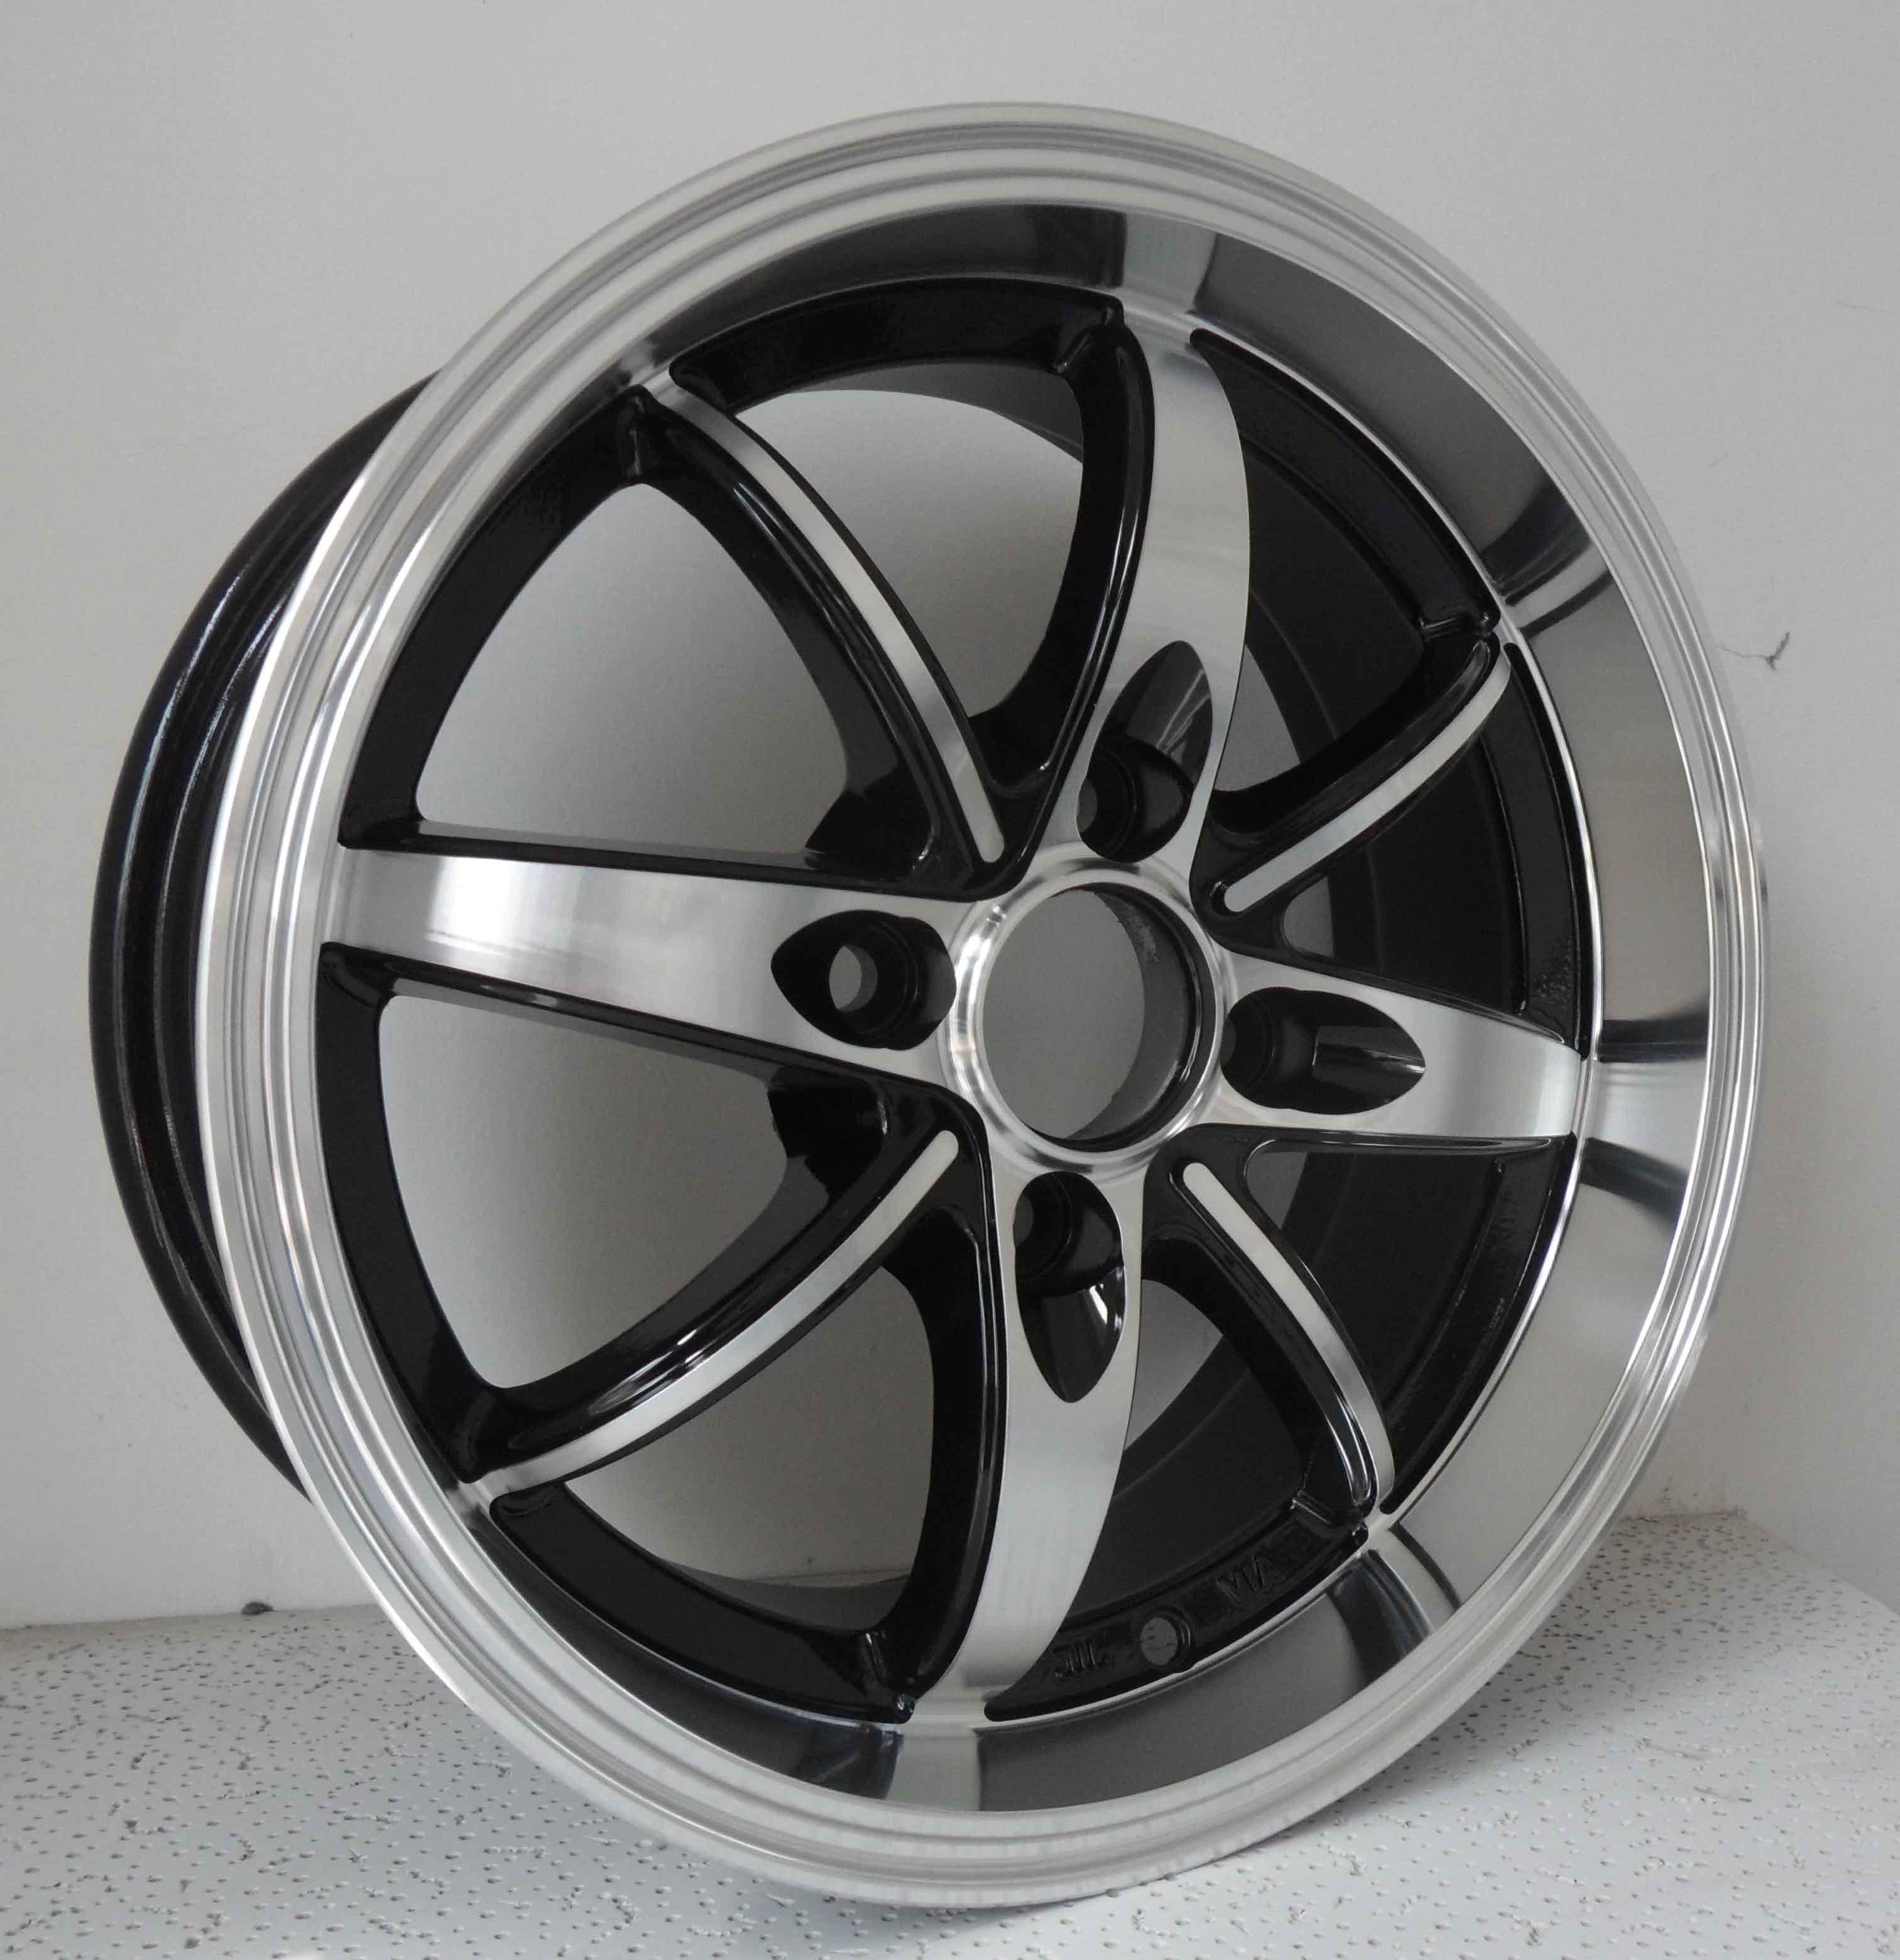 Aftermarket Alloy Wheel (KC519)